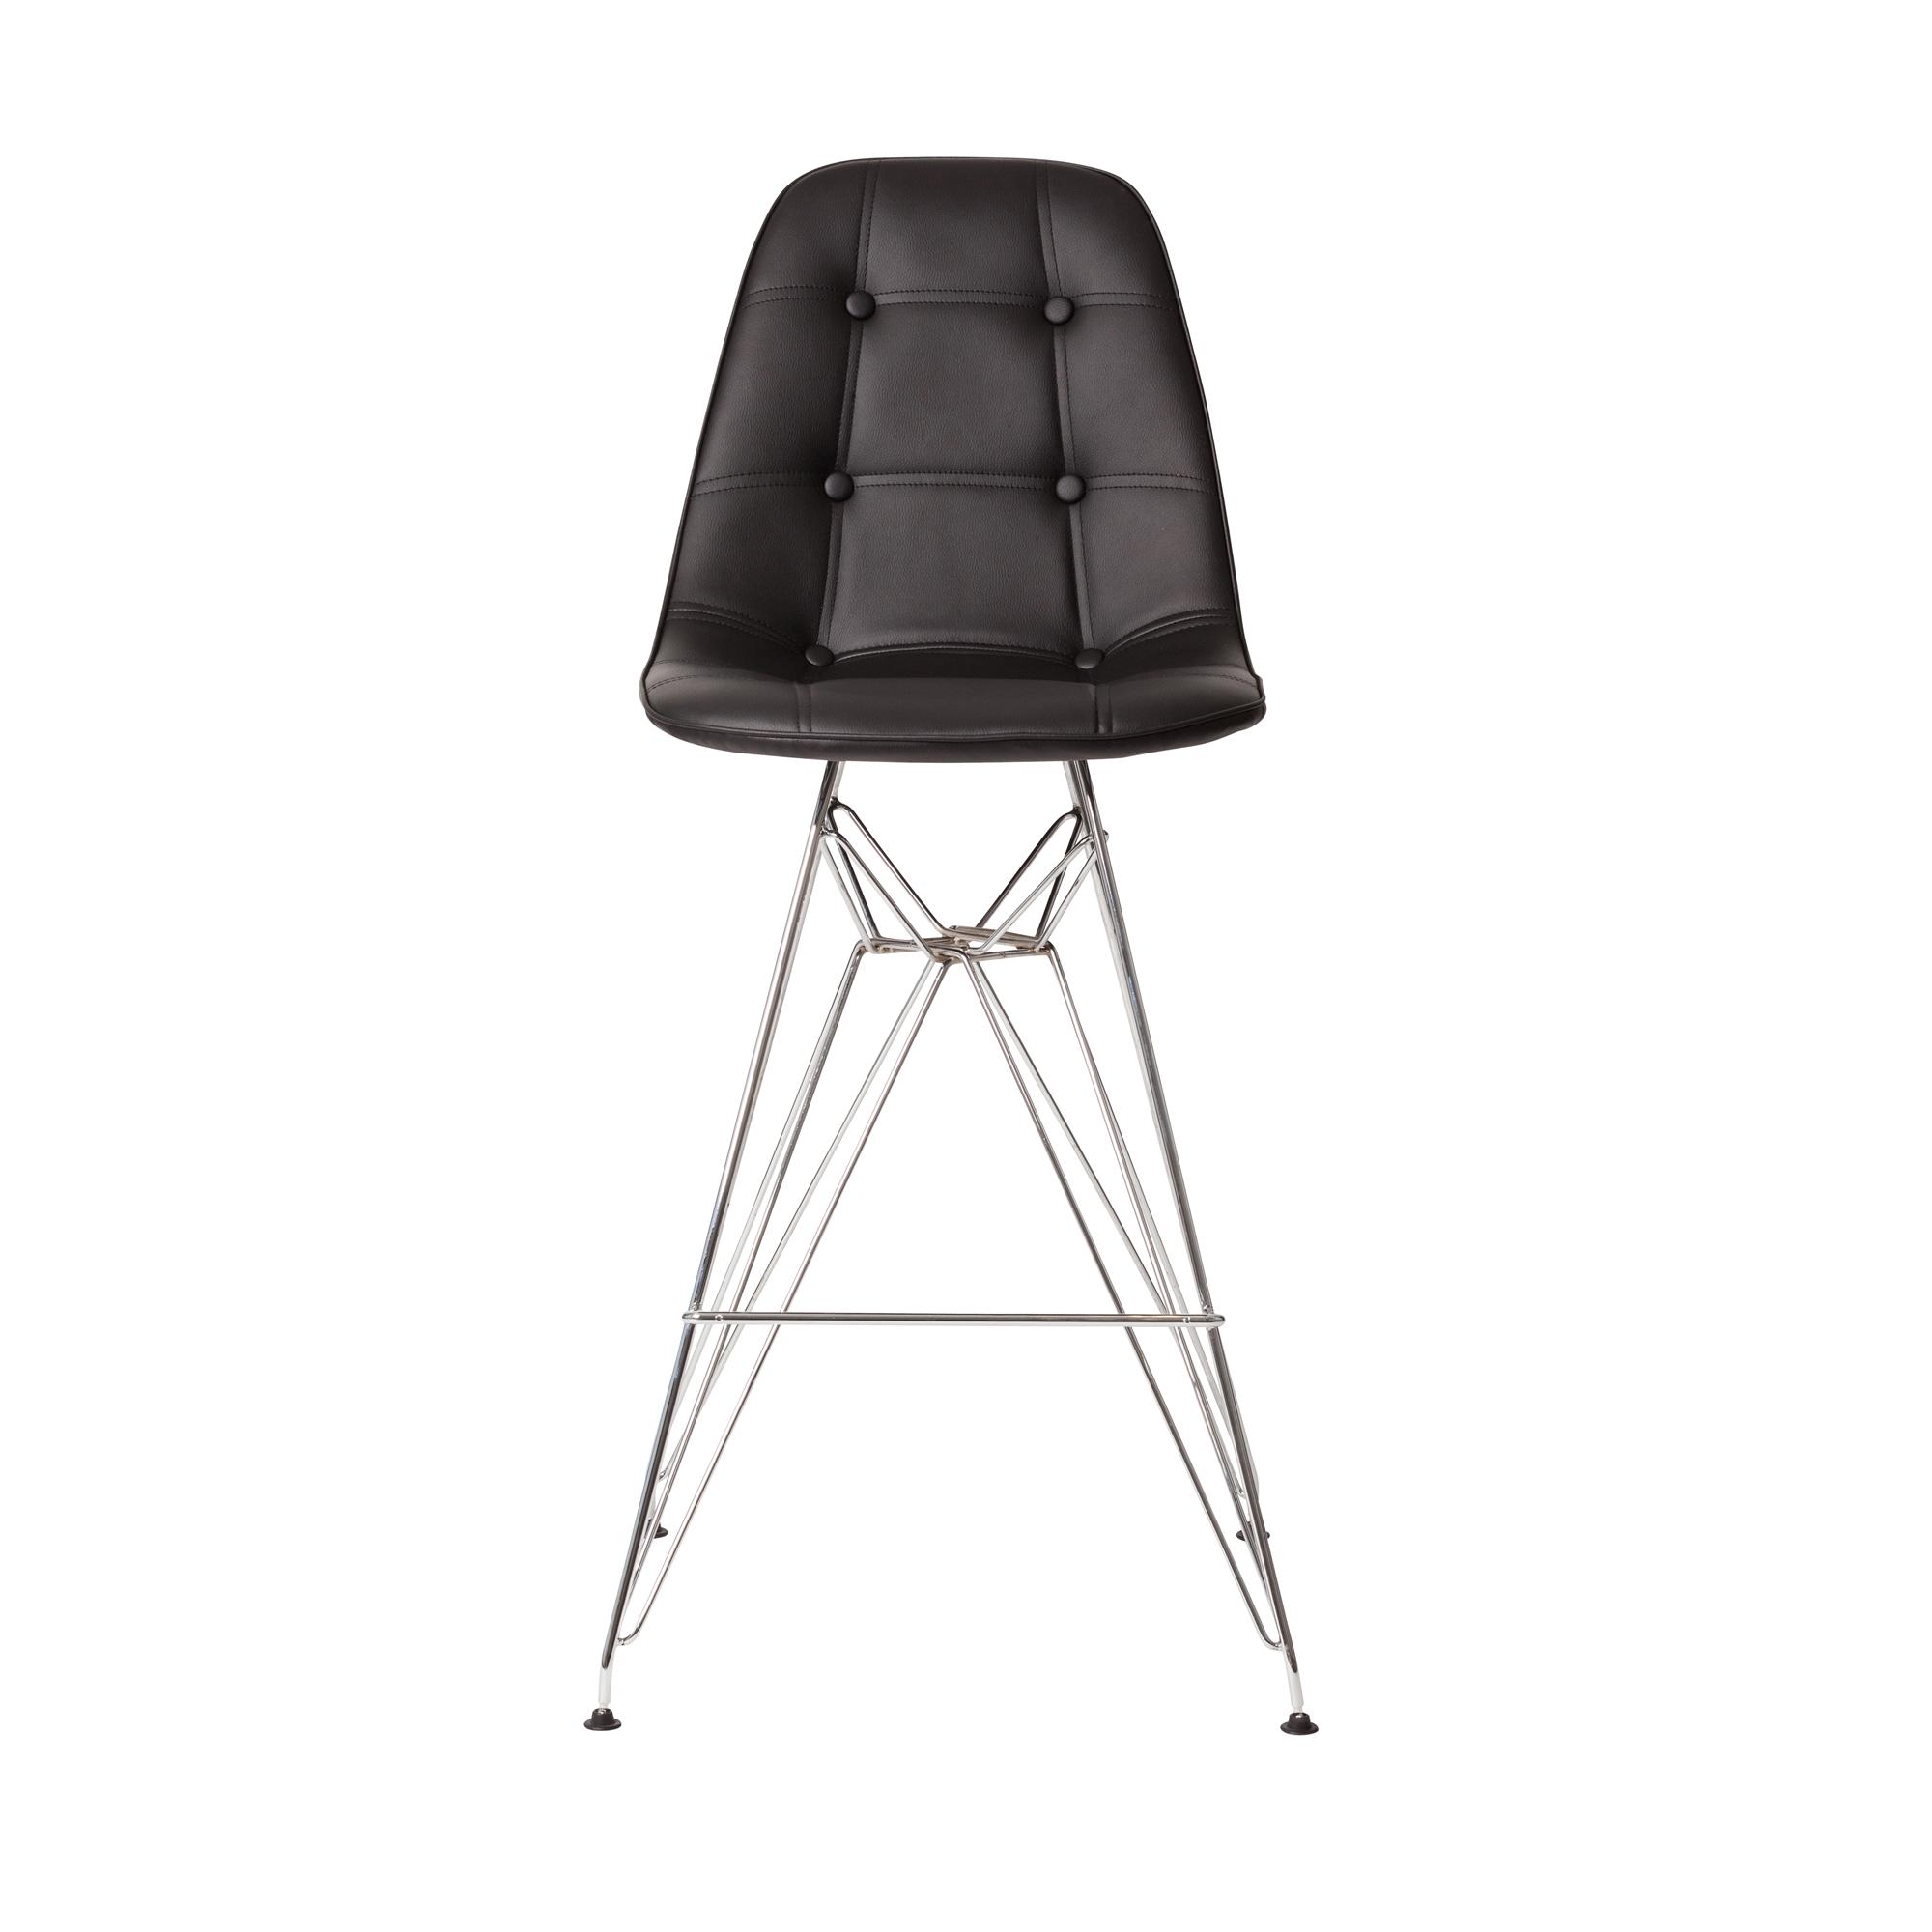 Pleasing Chrome Counter Stool In Black Leather Lamtechconsult Wood Chair Design Ideas Lamtechconsultcom